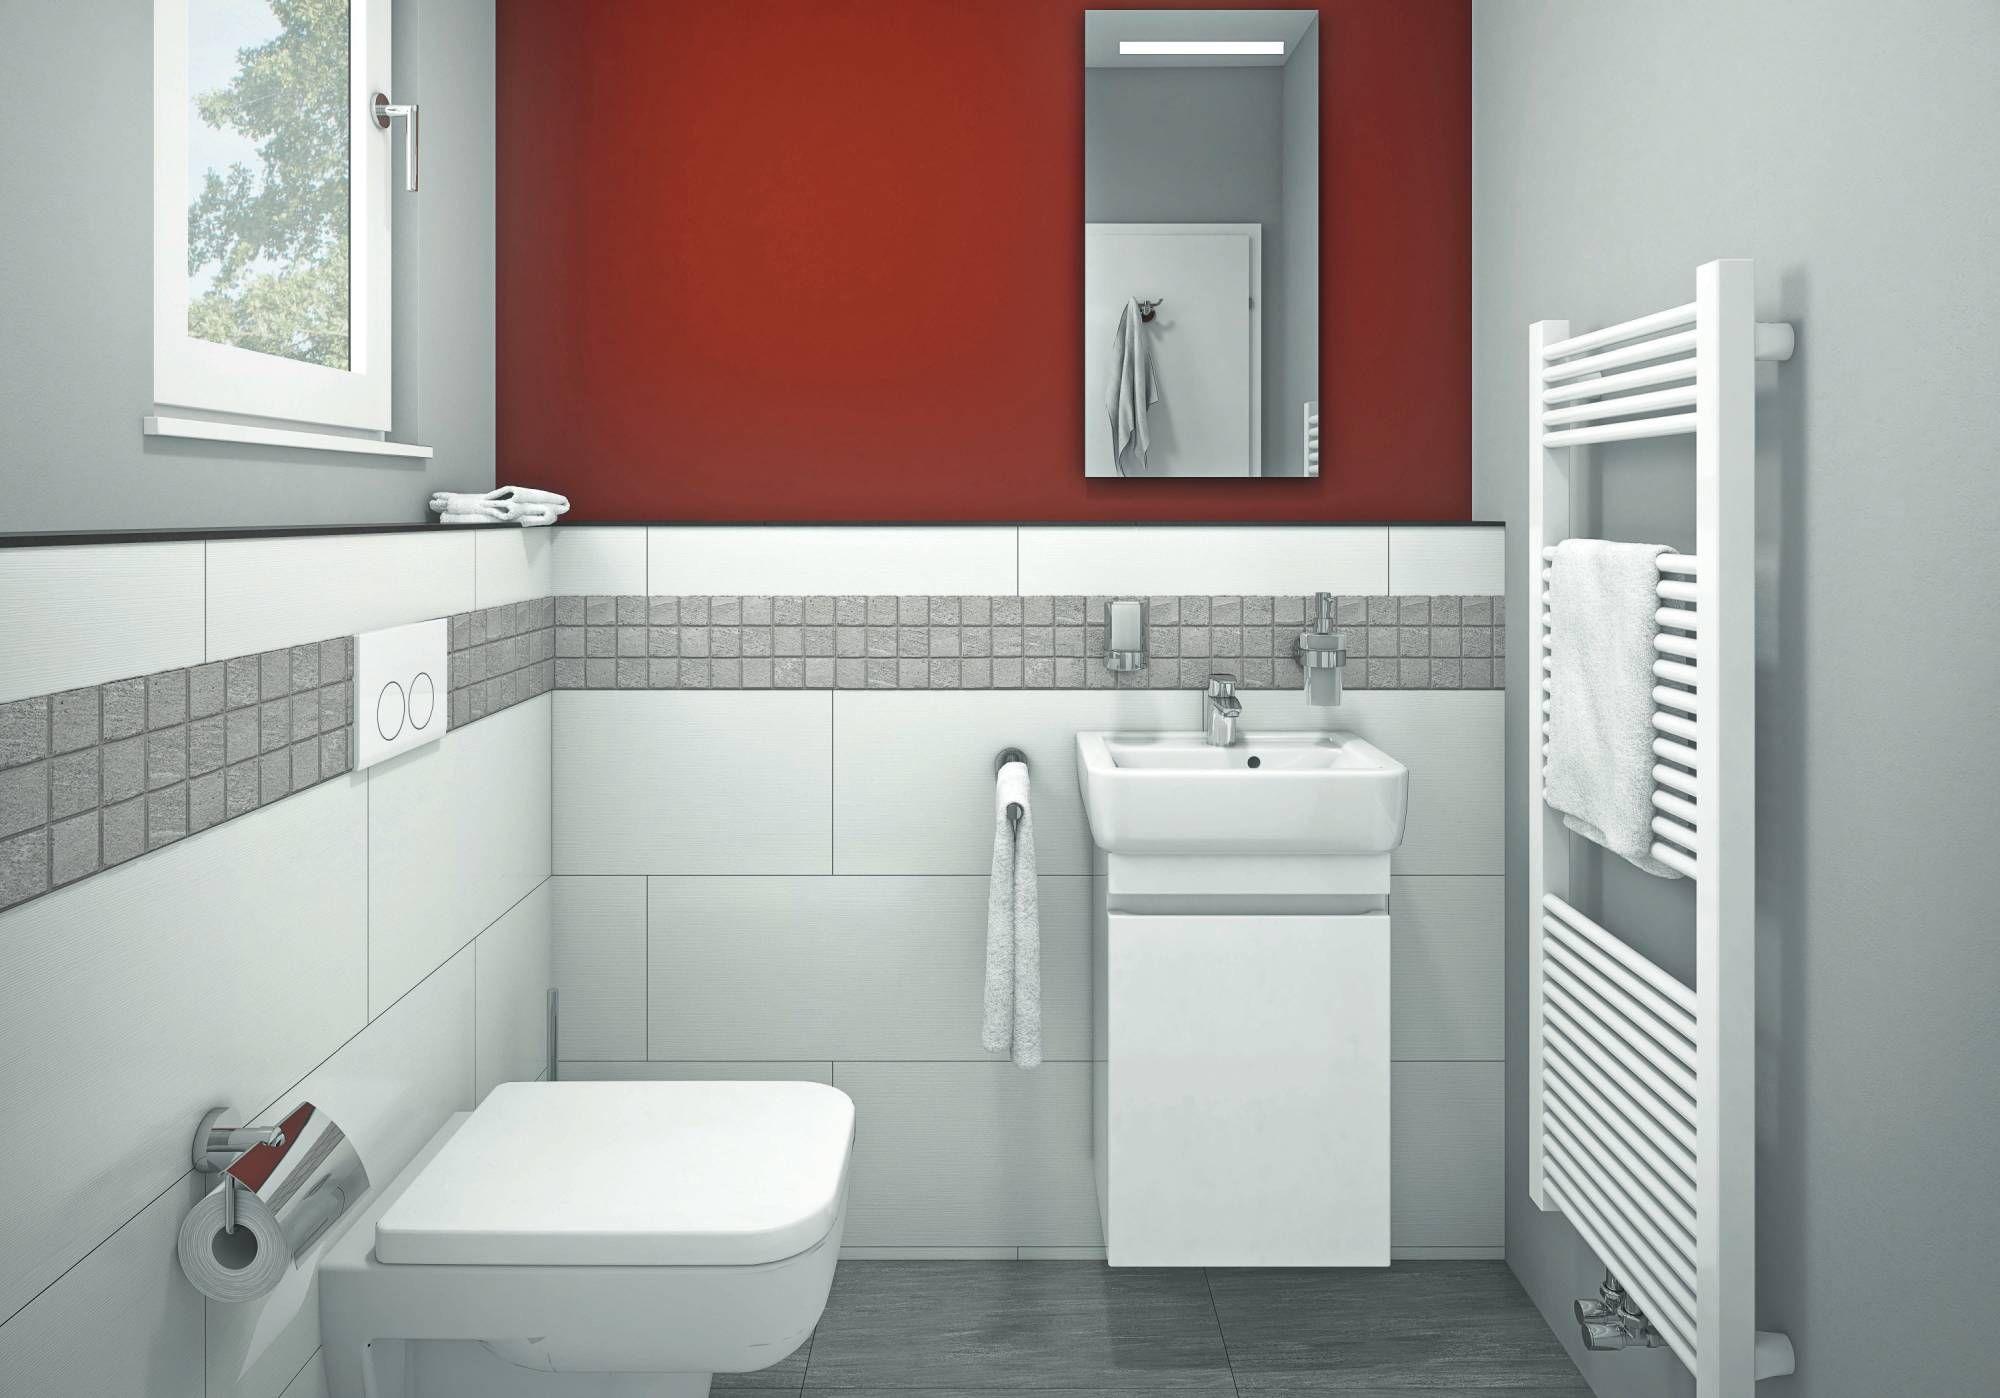 20 Fliesenmuster Schadens   Home appliances, House plans, Bathroom